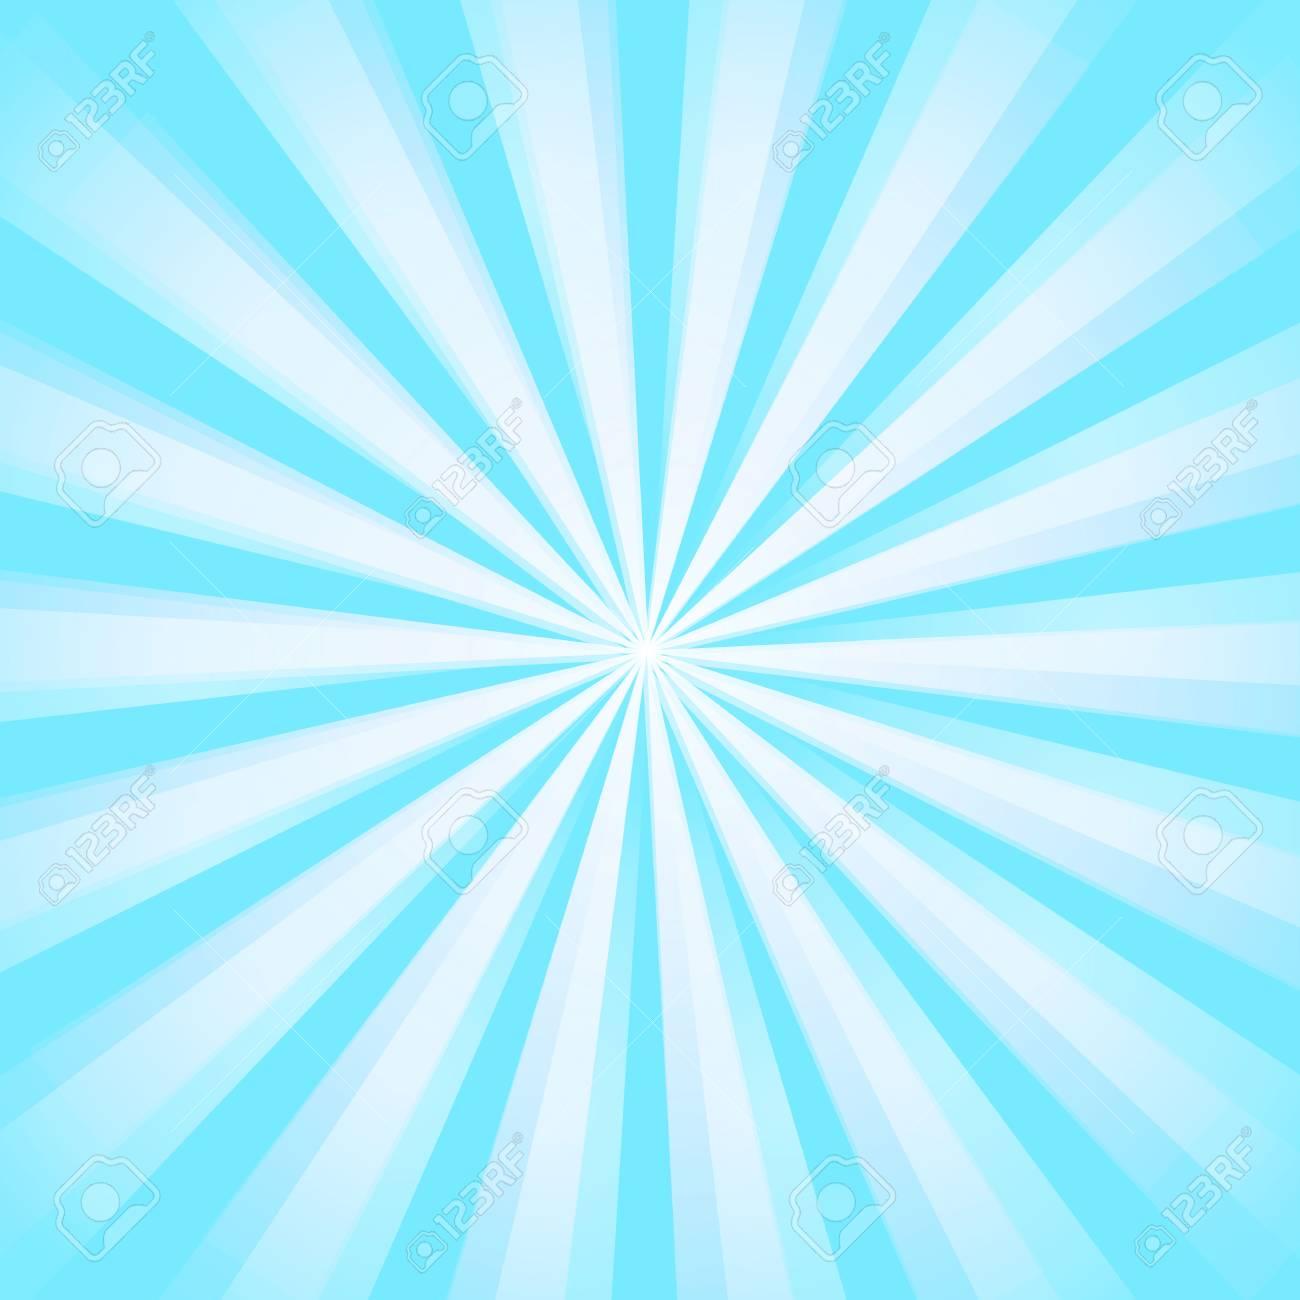 887dd9a0f5d Shiny sun ray background. Sun Sunburst Pattern. Blue rays summer..